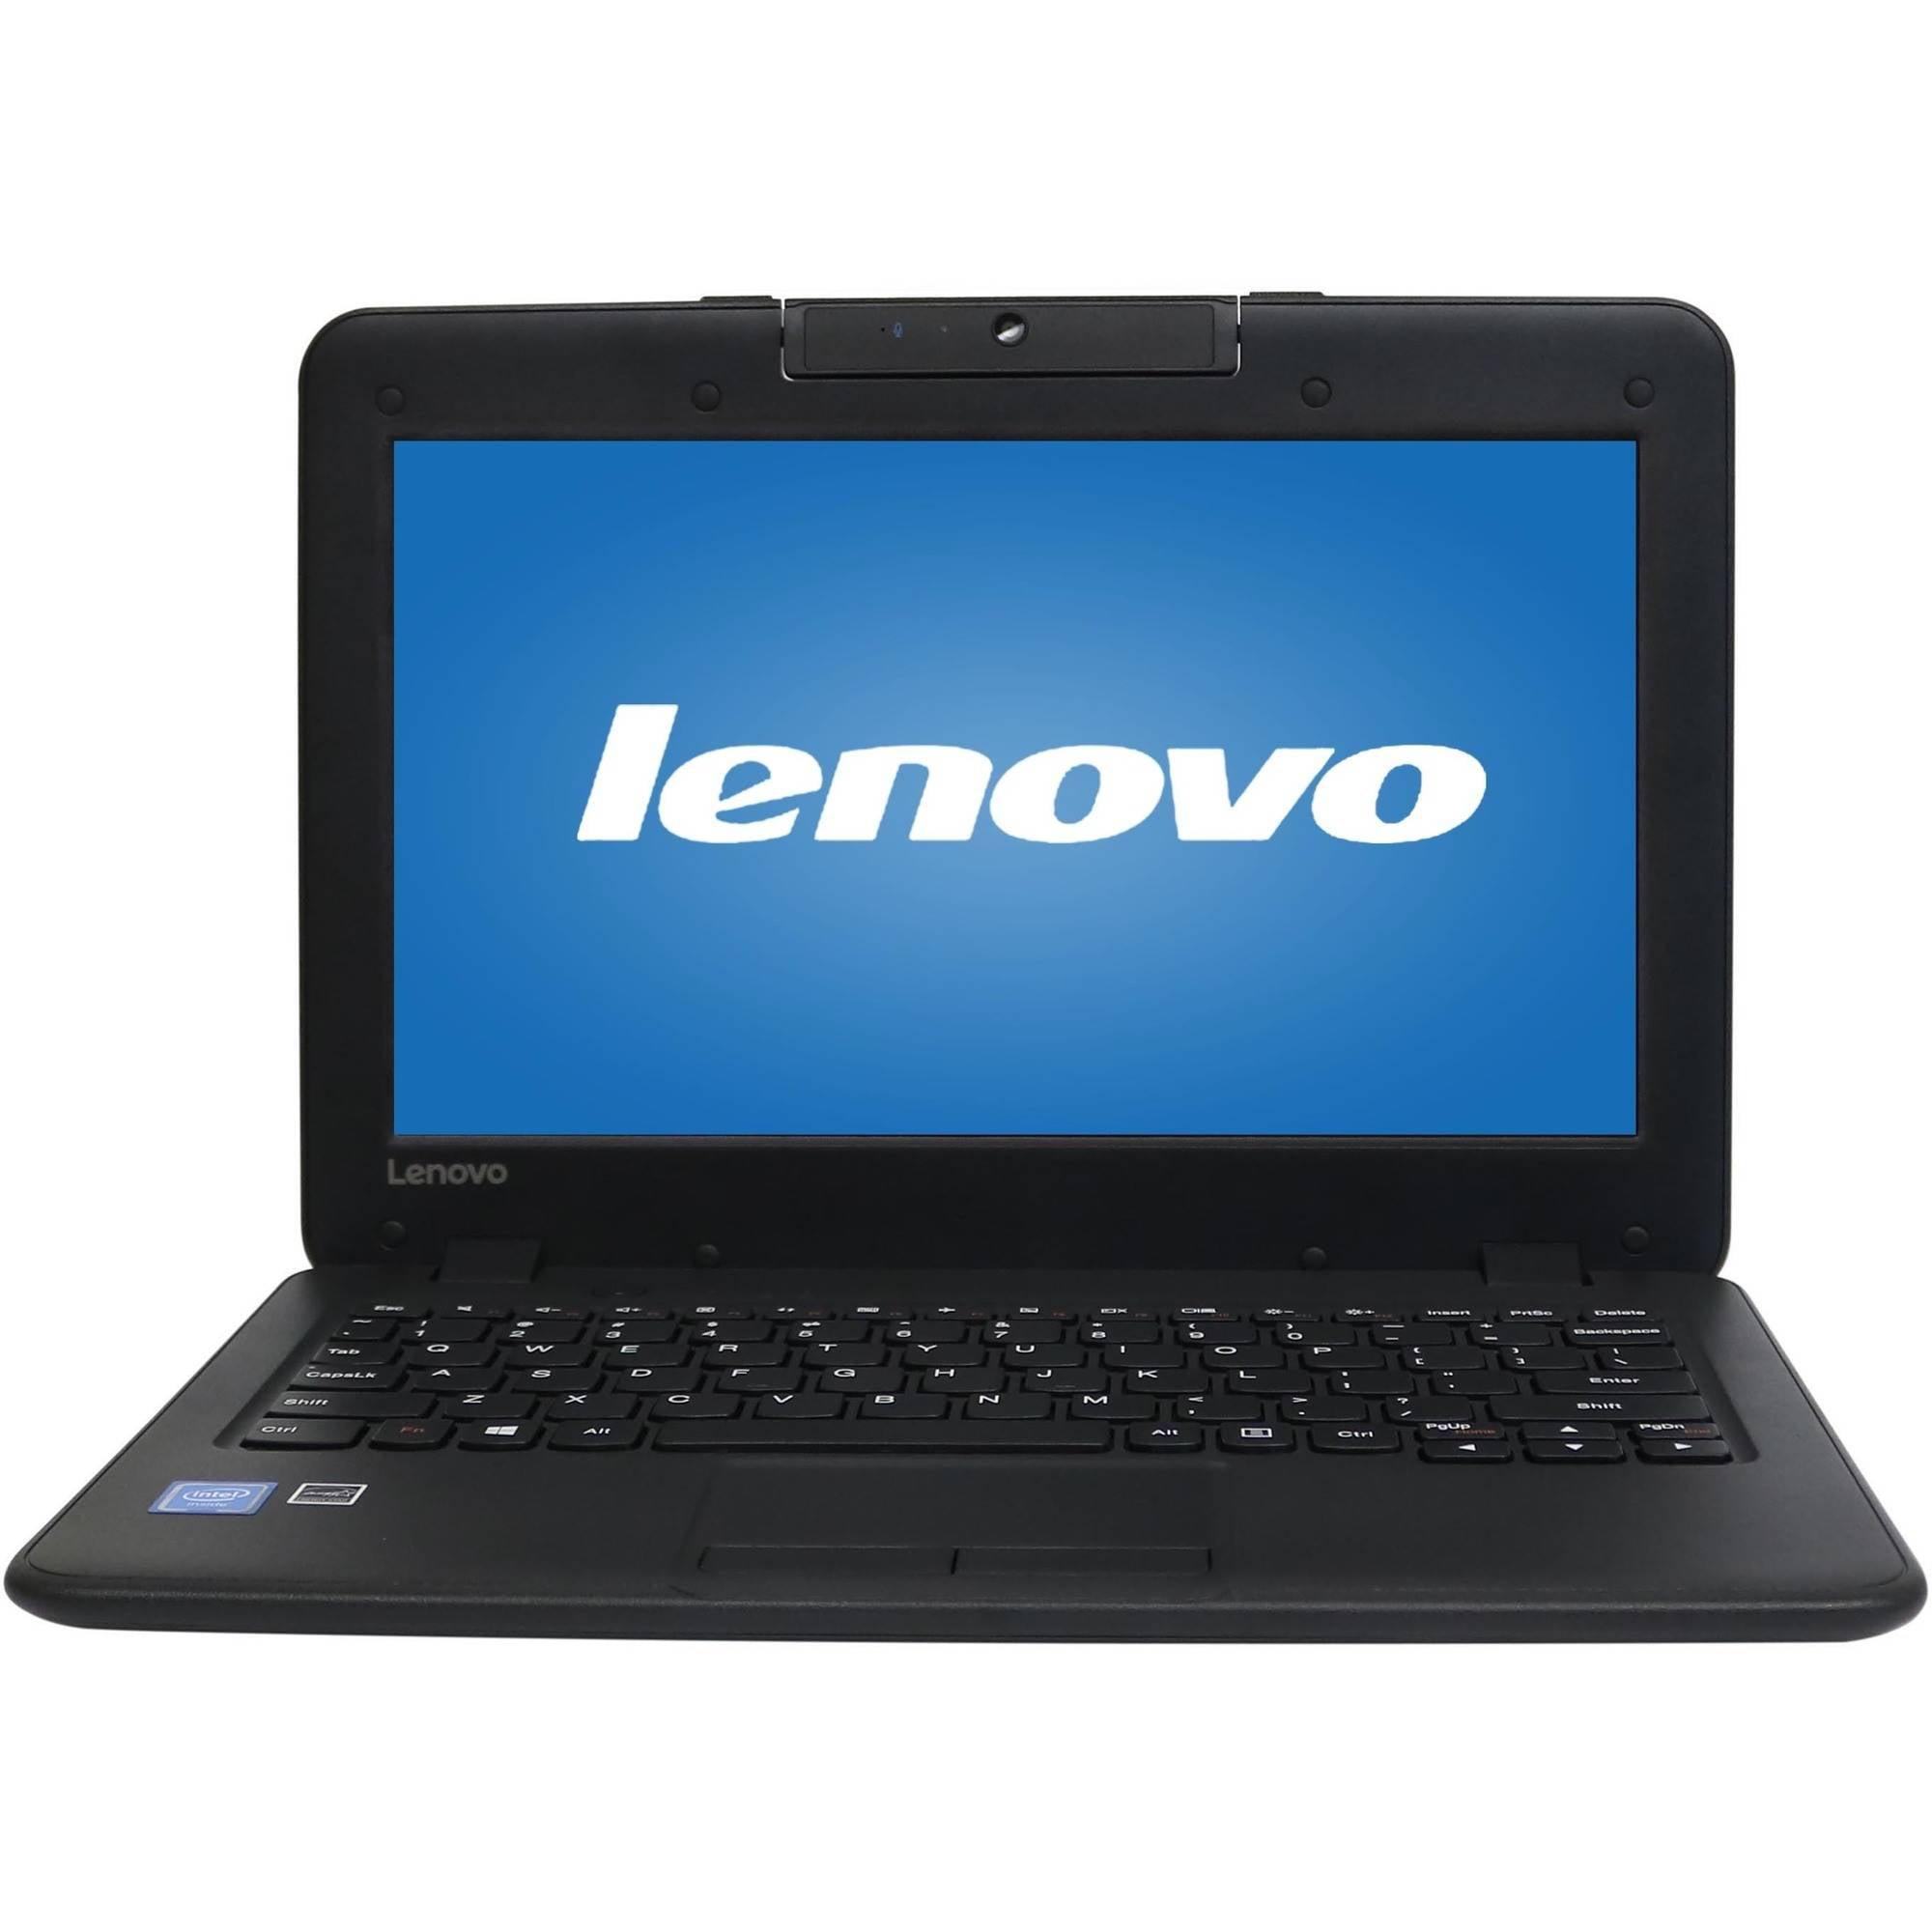 "Lenovo ThinkPad N22 11.6"" Laptop, Windows 10, Intel Celeron N3050 Processor, 4GB RAM, 32GB Solid State Drive"